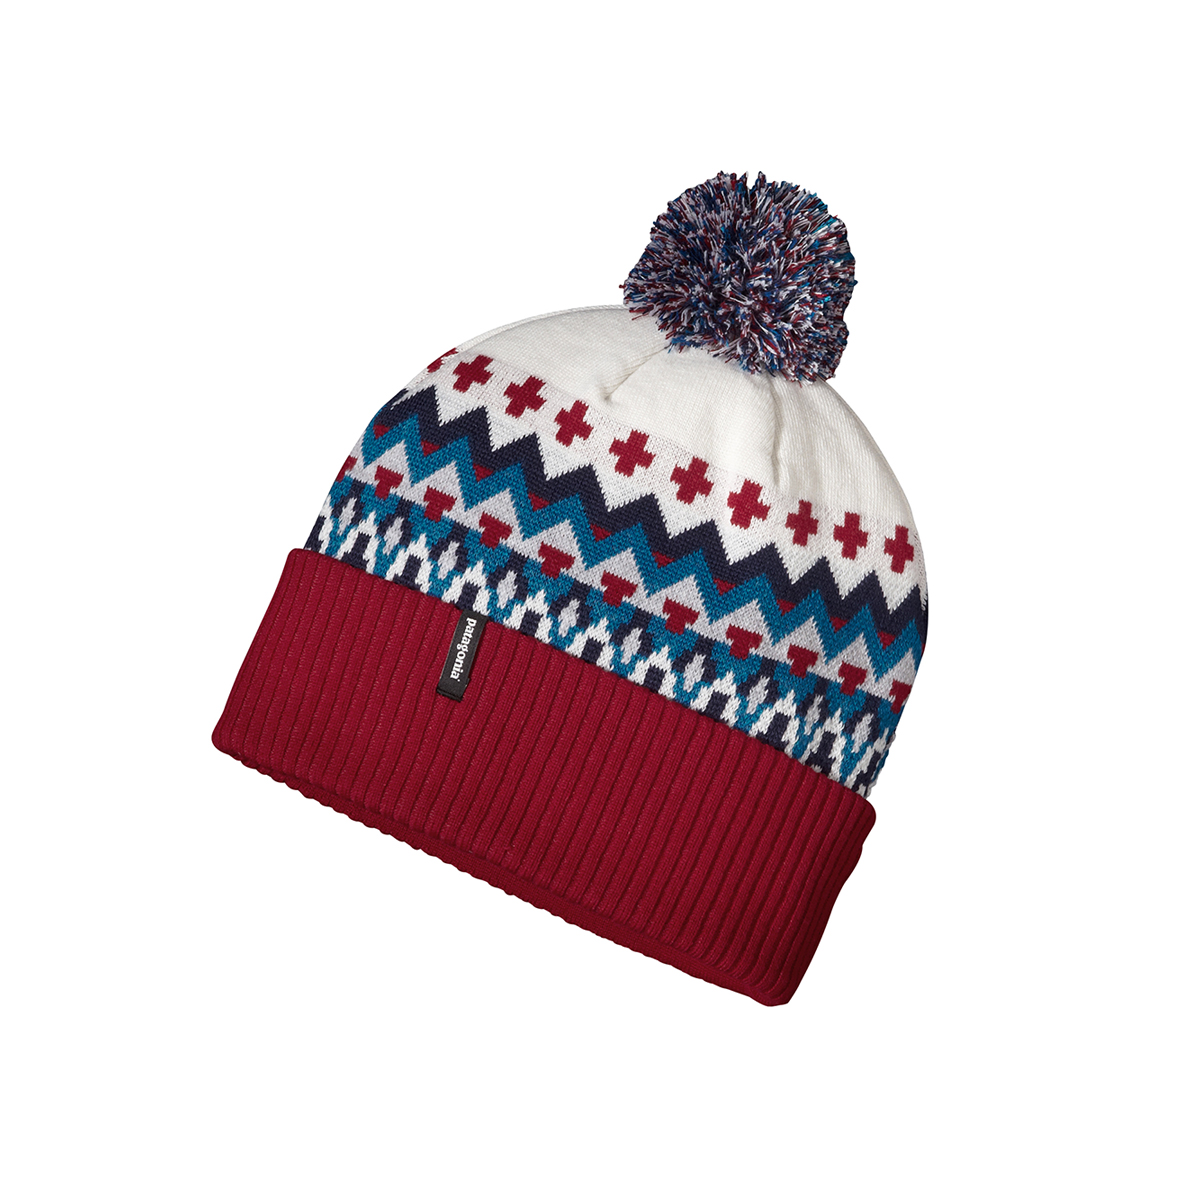 3e8c6afd1cc ... free shipping patagonia powder town beanie hats caps epictv shop efb6a  46e04